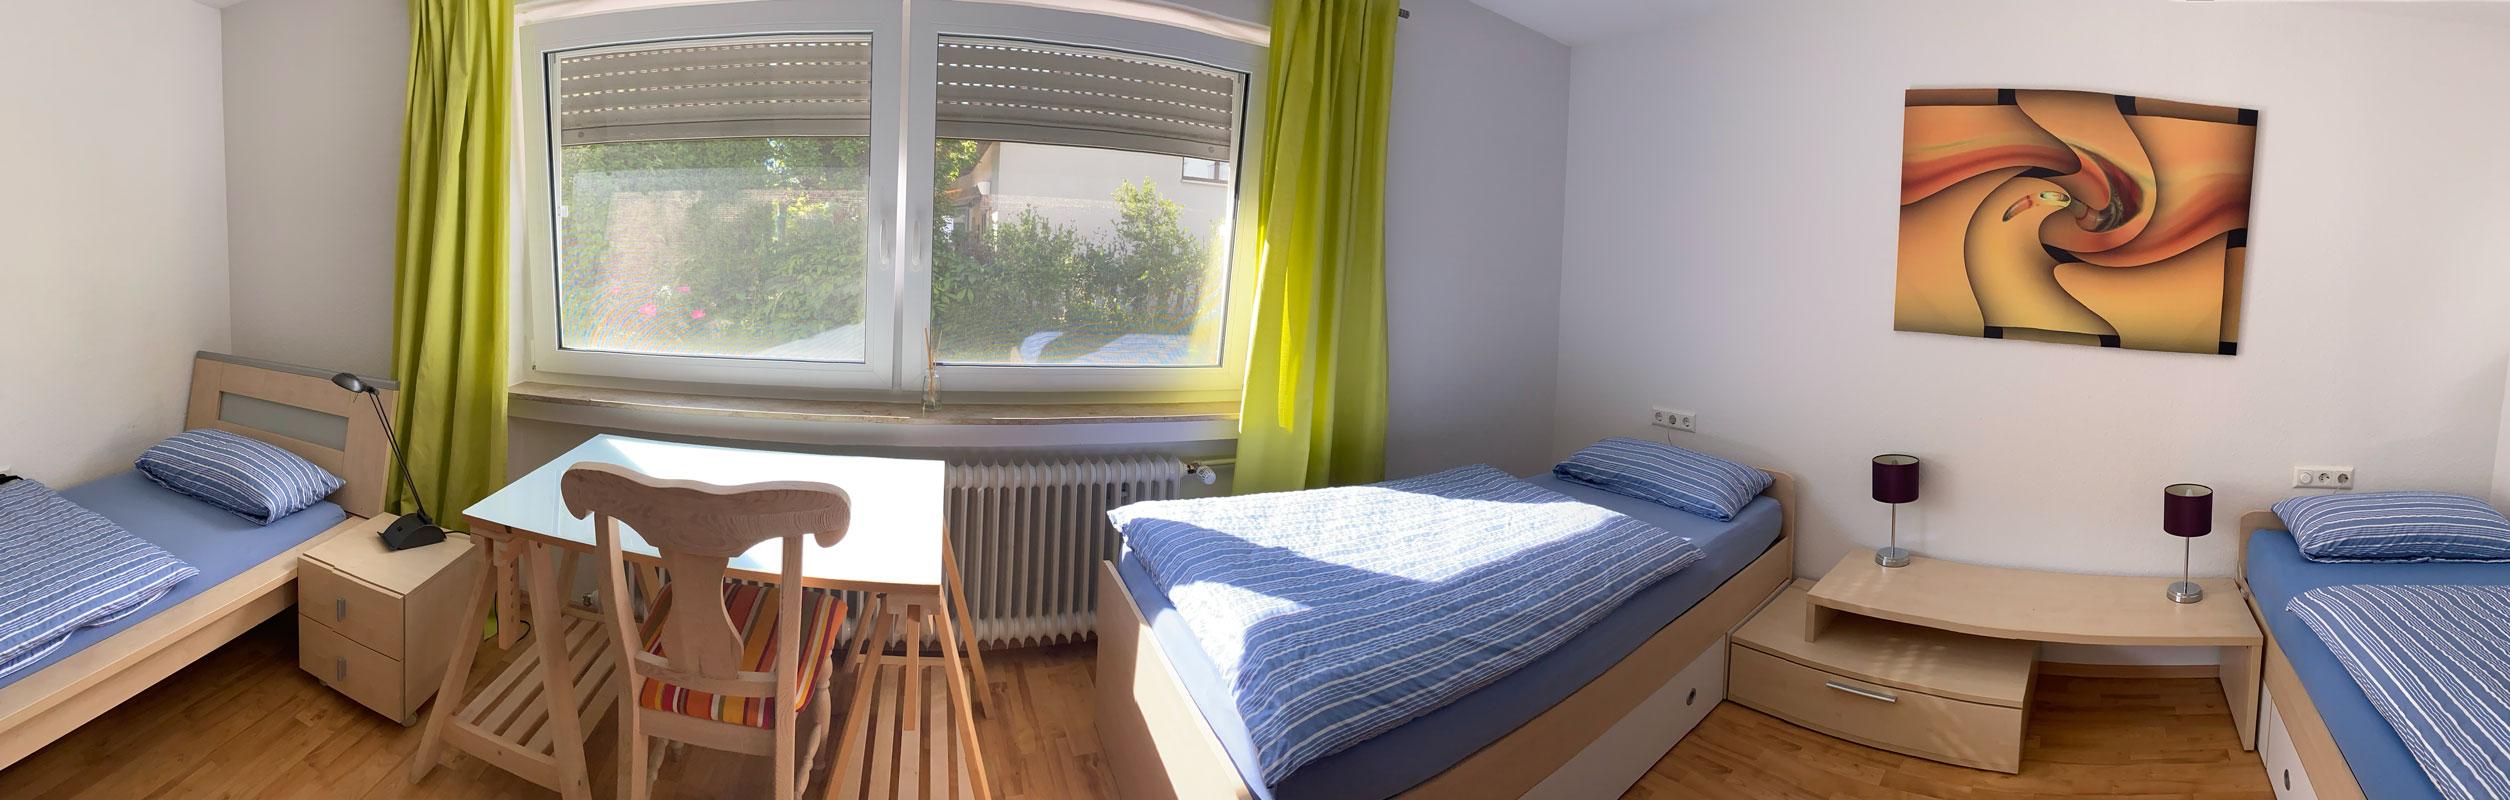 UG Schlafzimmer 1